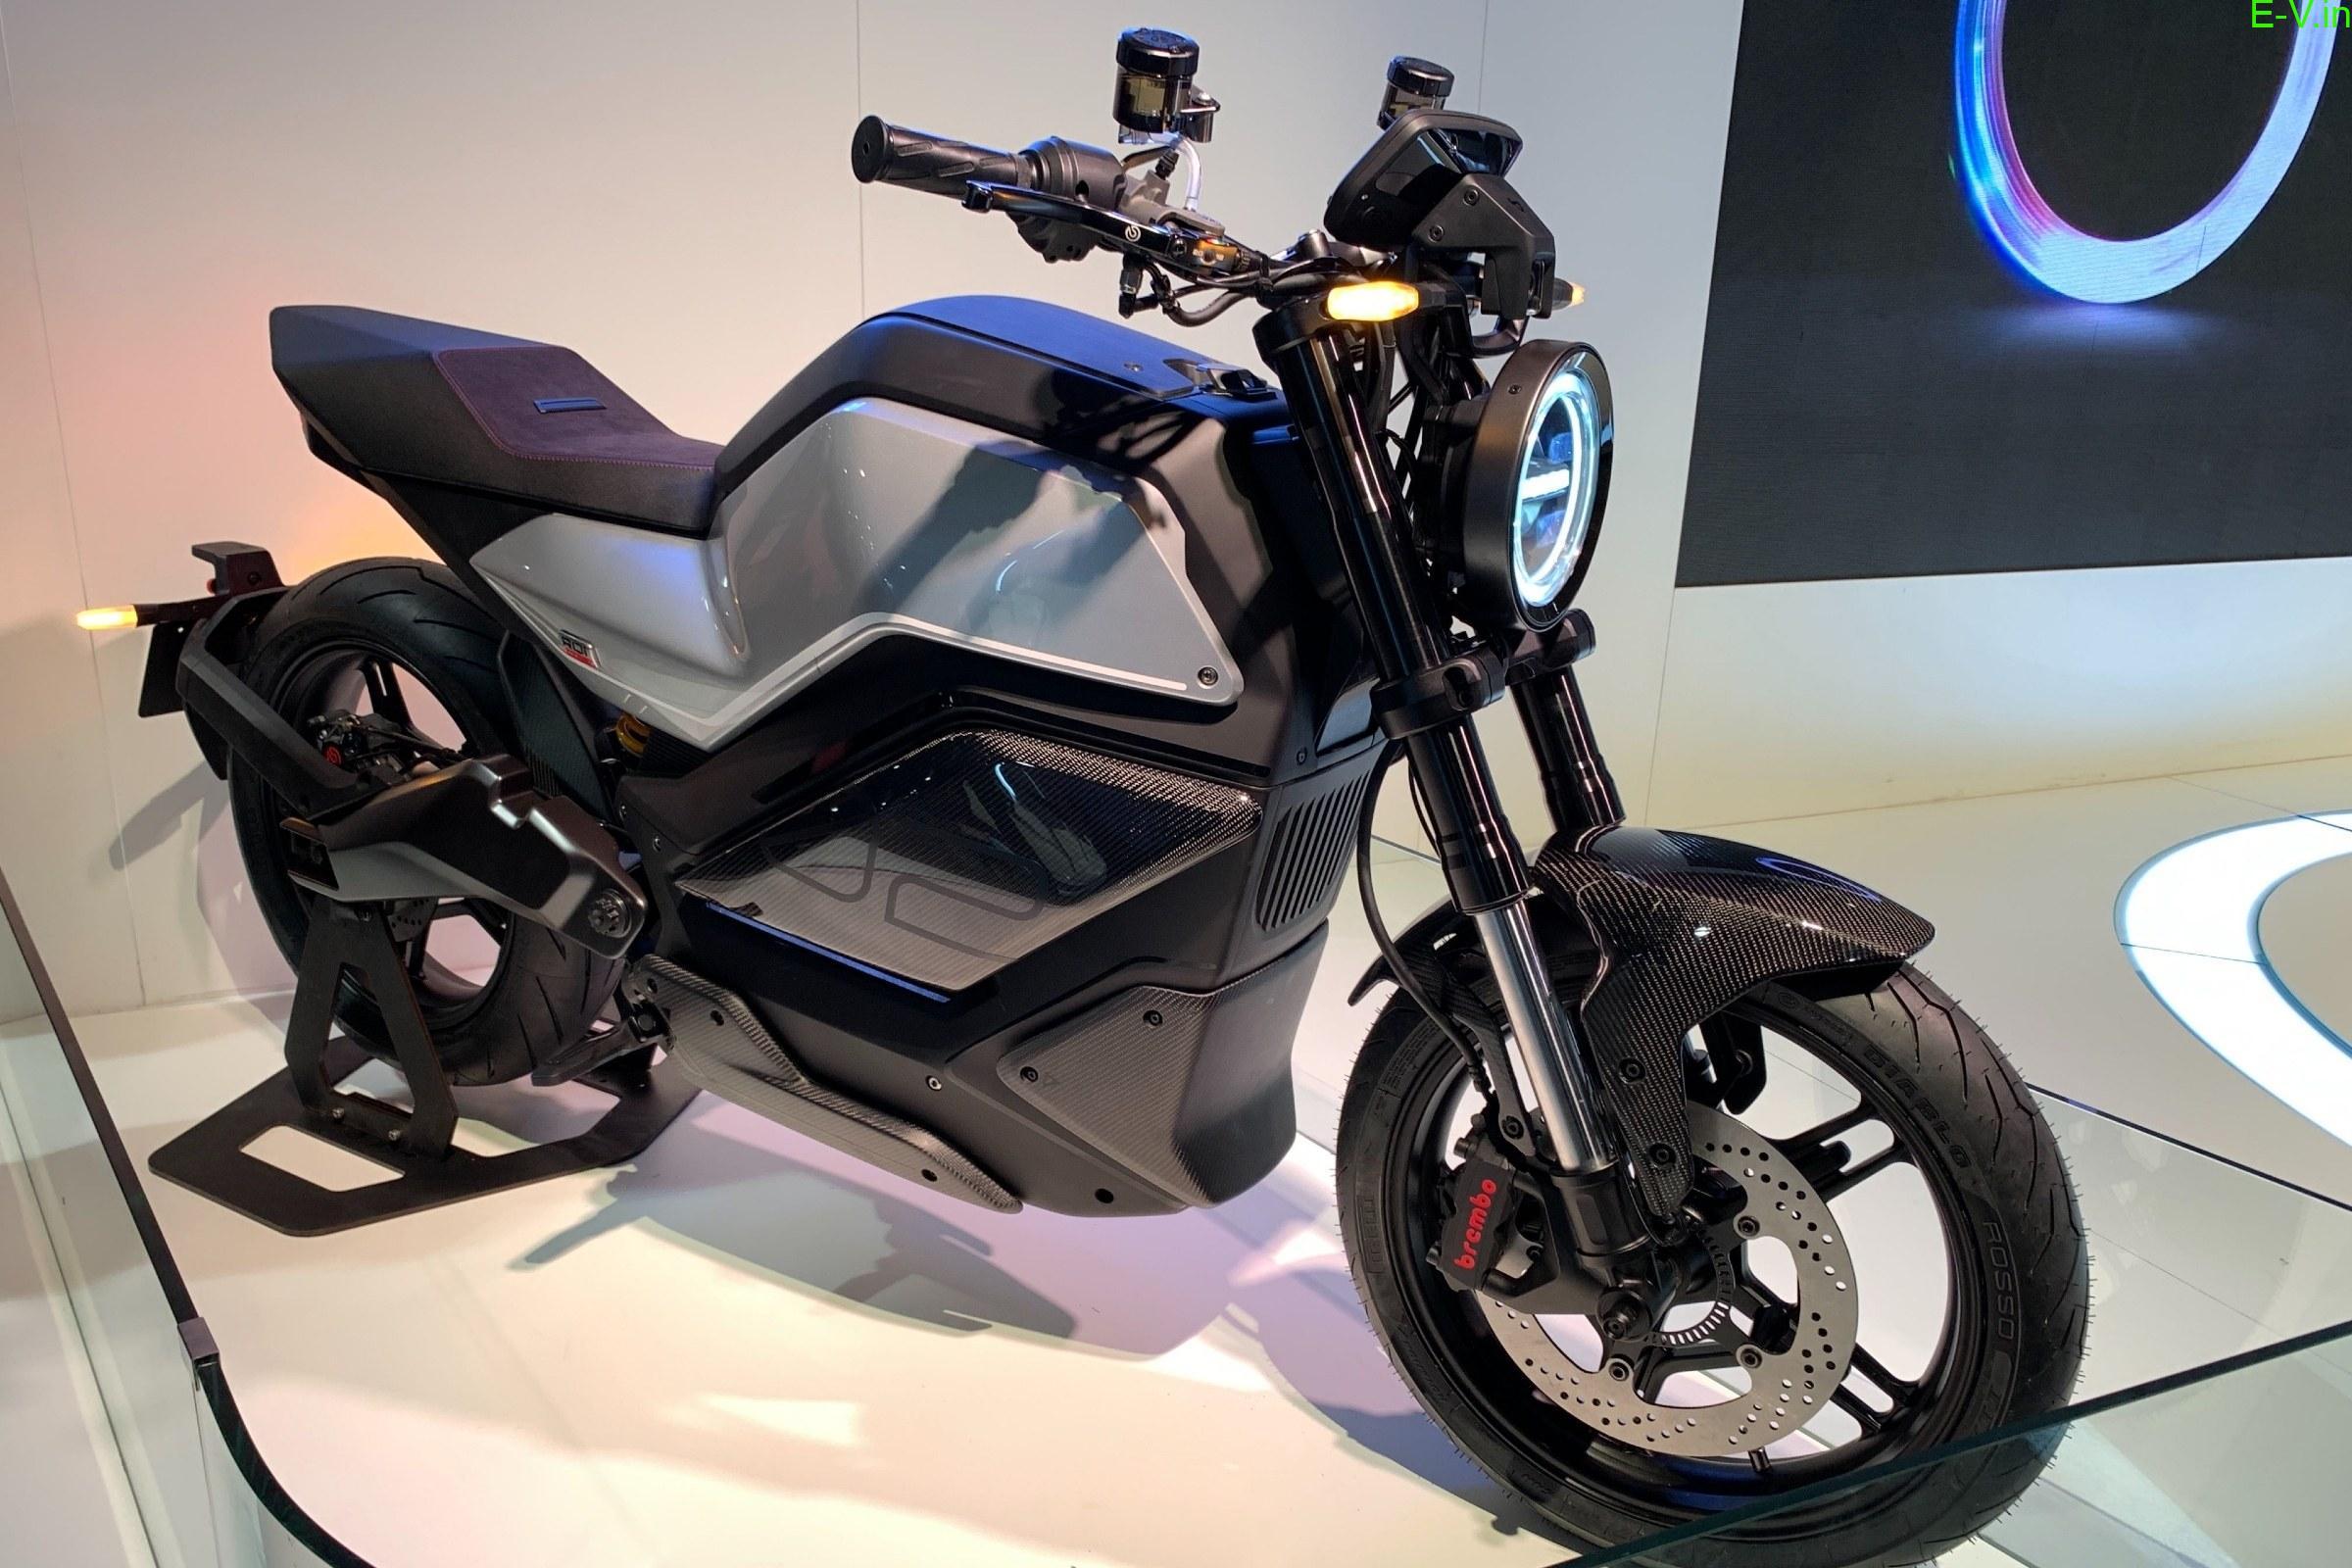 NIU RQi electric motorcycle